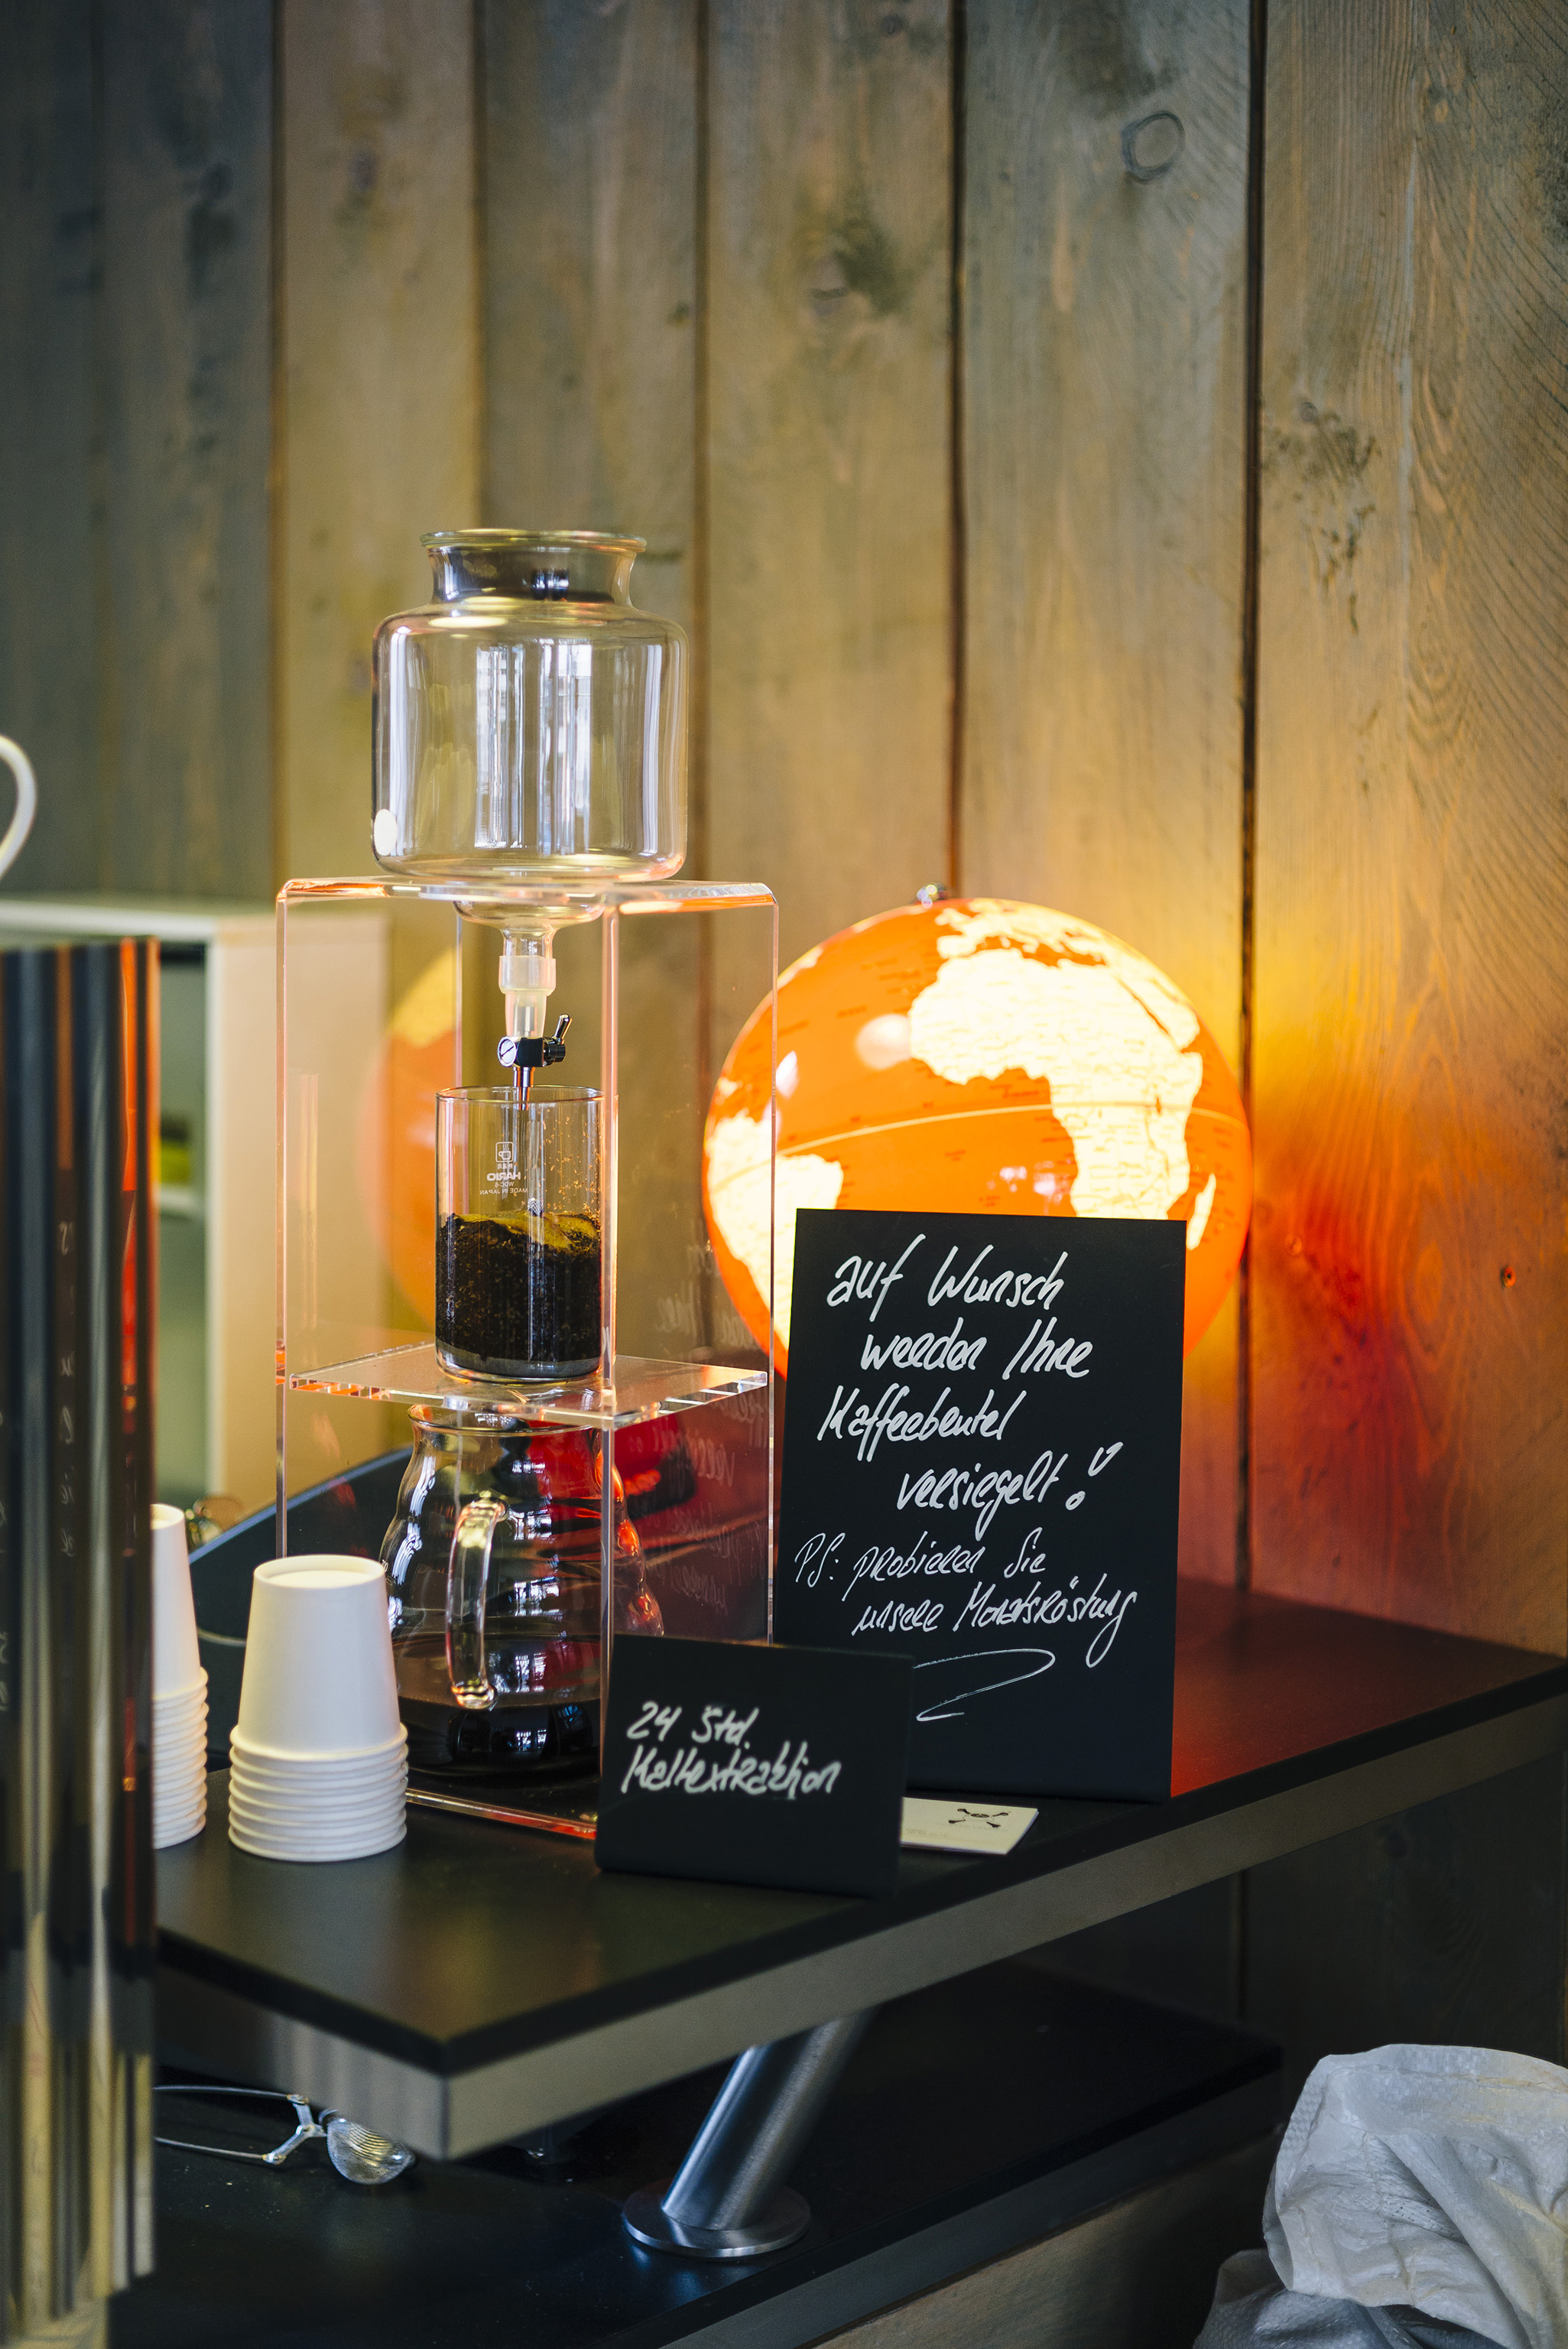 sweet-coffee-pirates-rüttenscheid-essen-pottspott-31.jpg